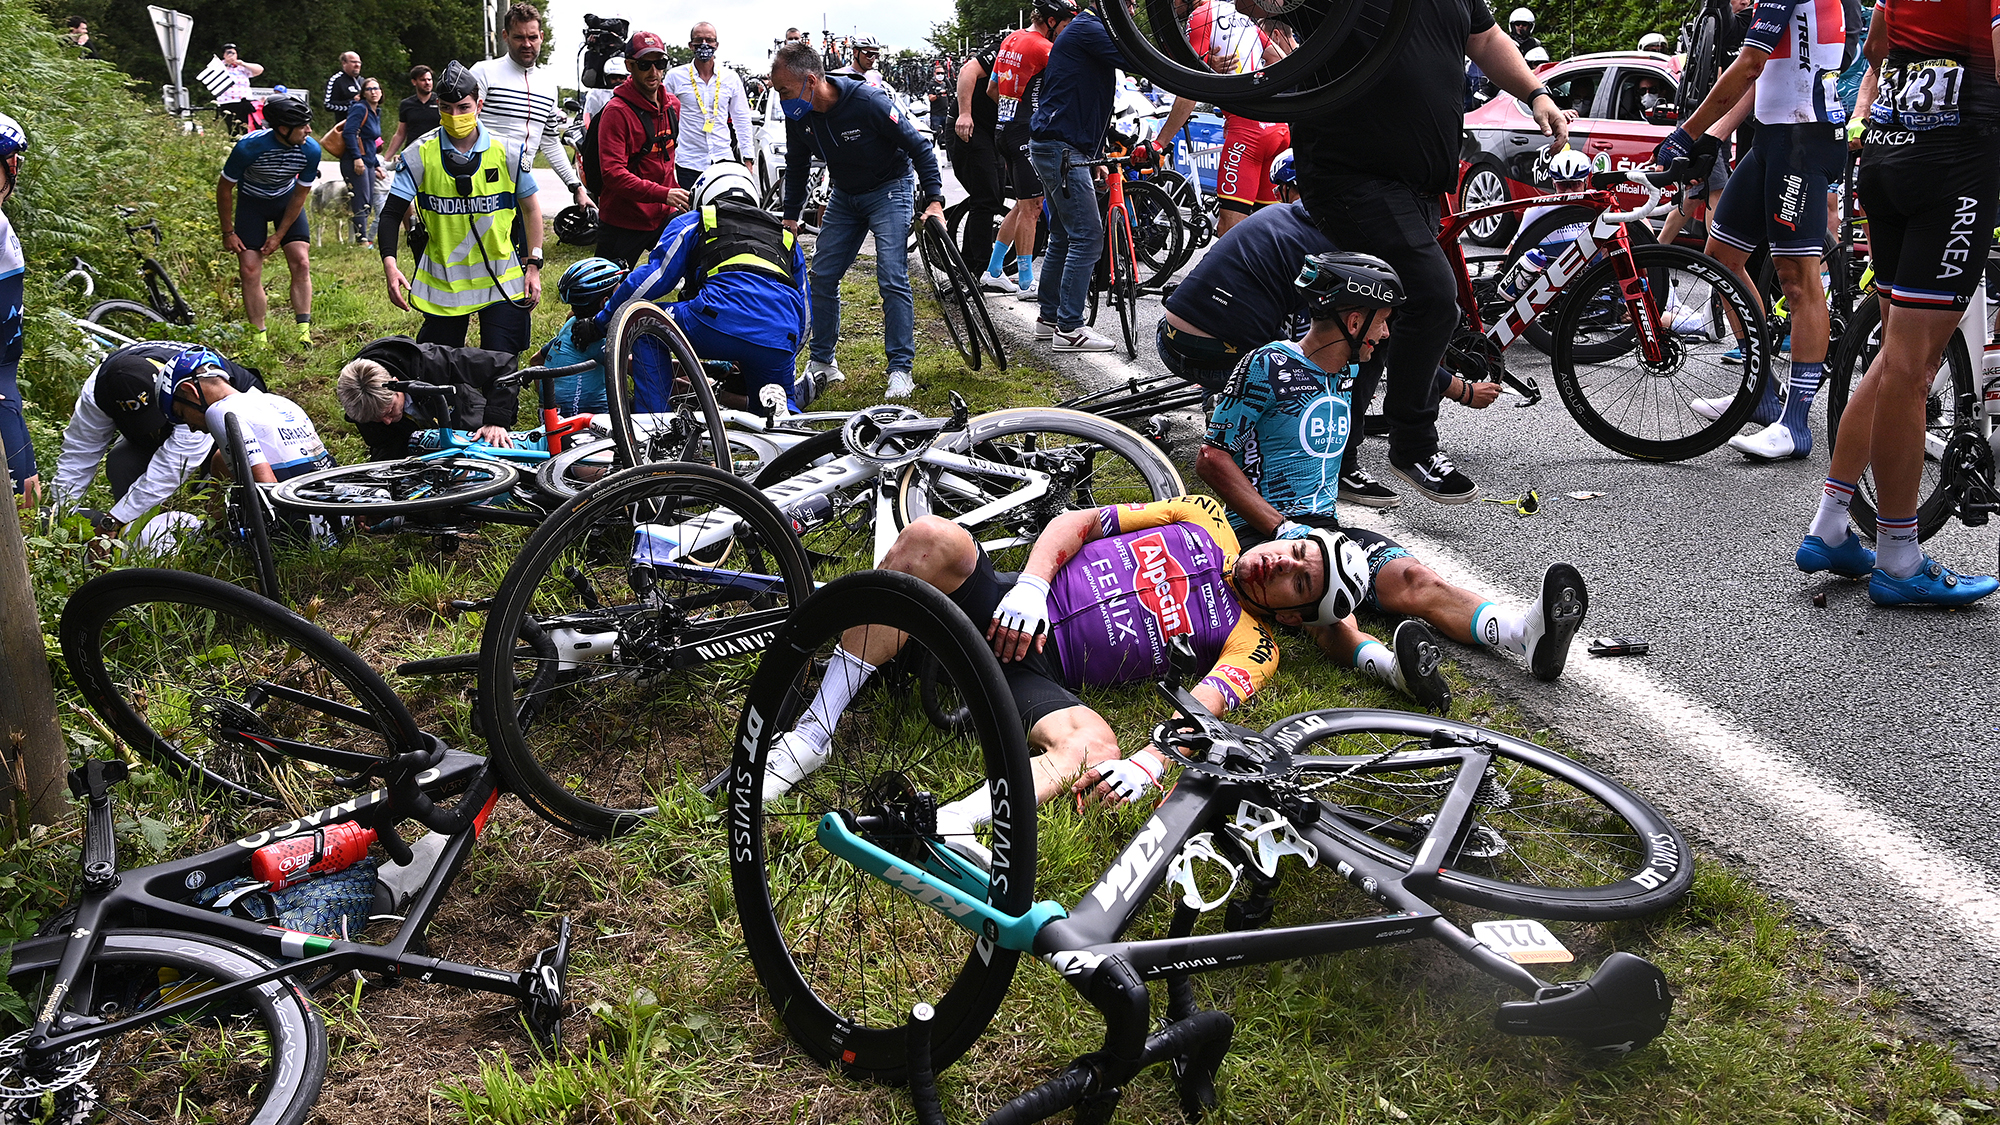 French authorities open investigation after Tour de France spectator causes massive crash